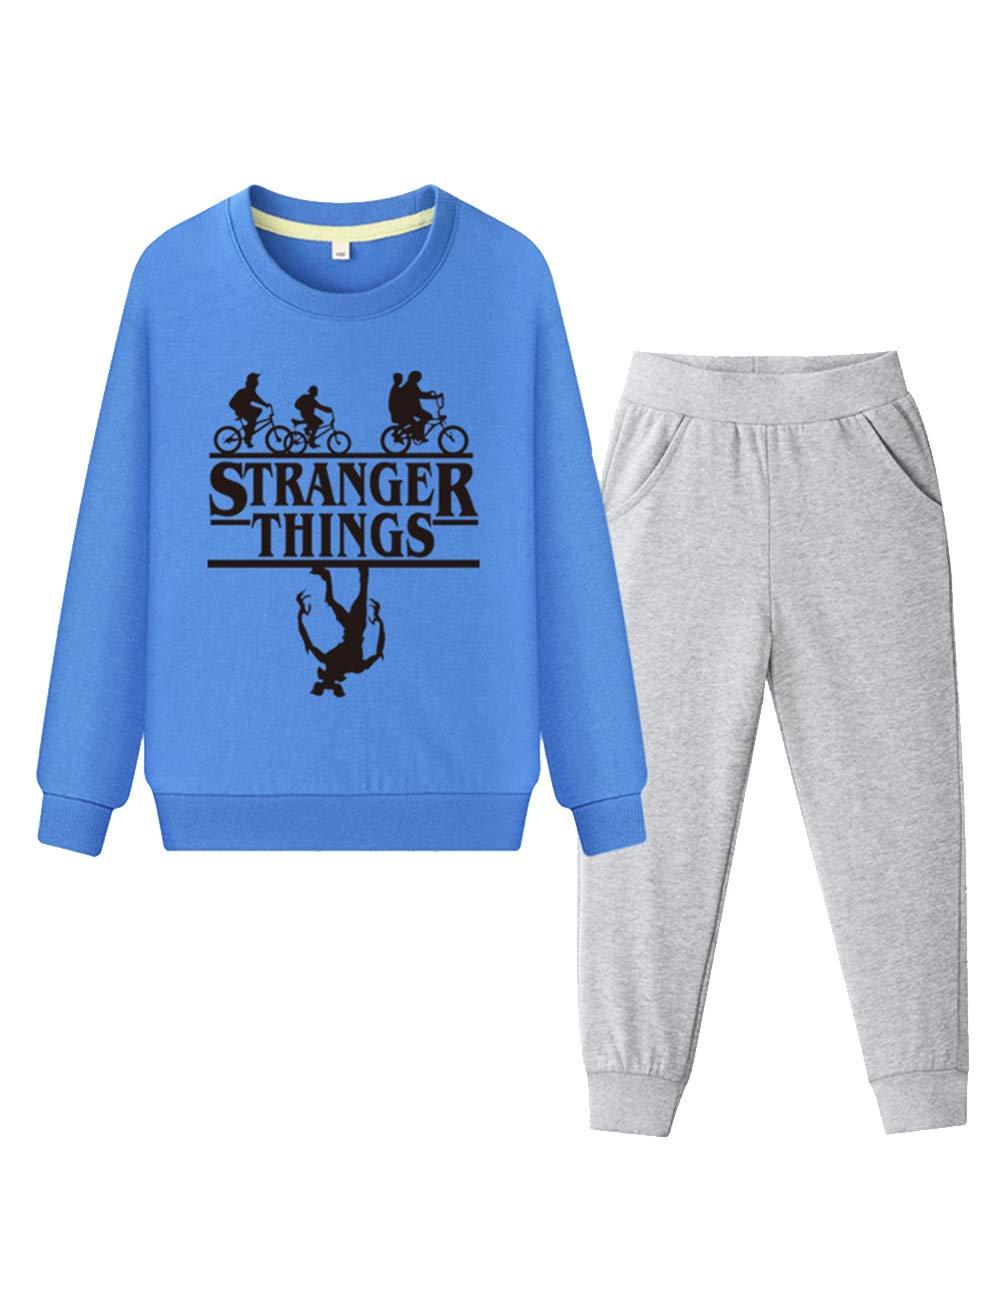 KIACIYA Stranger Things Conjuntos Niña Y Niños Chándal Stranger ...